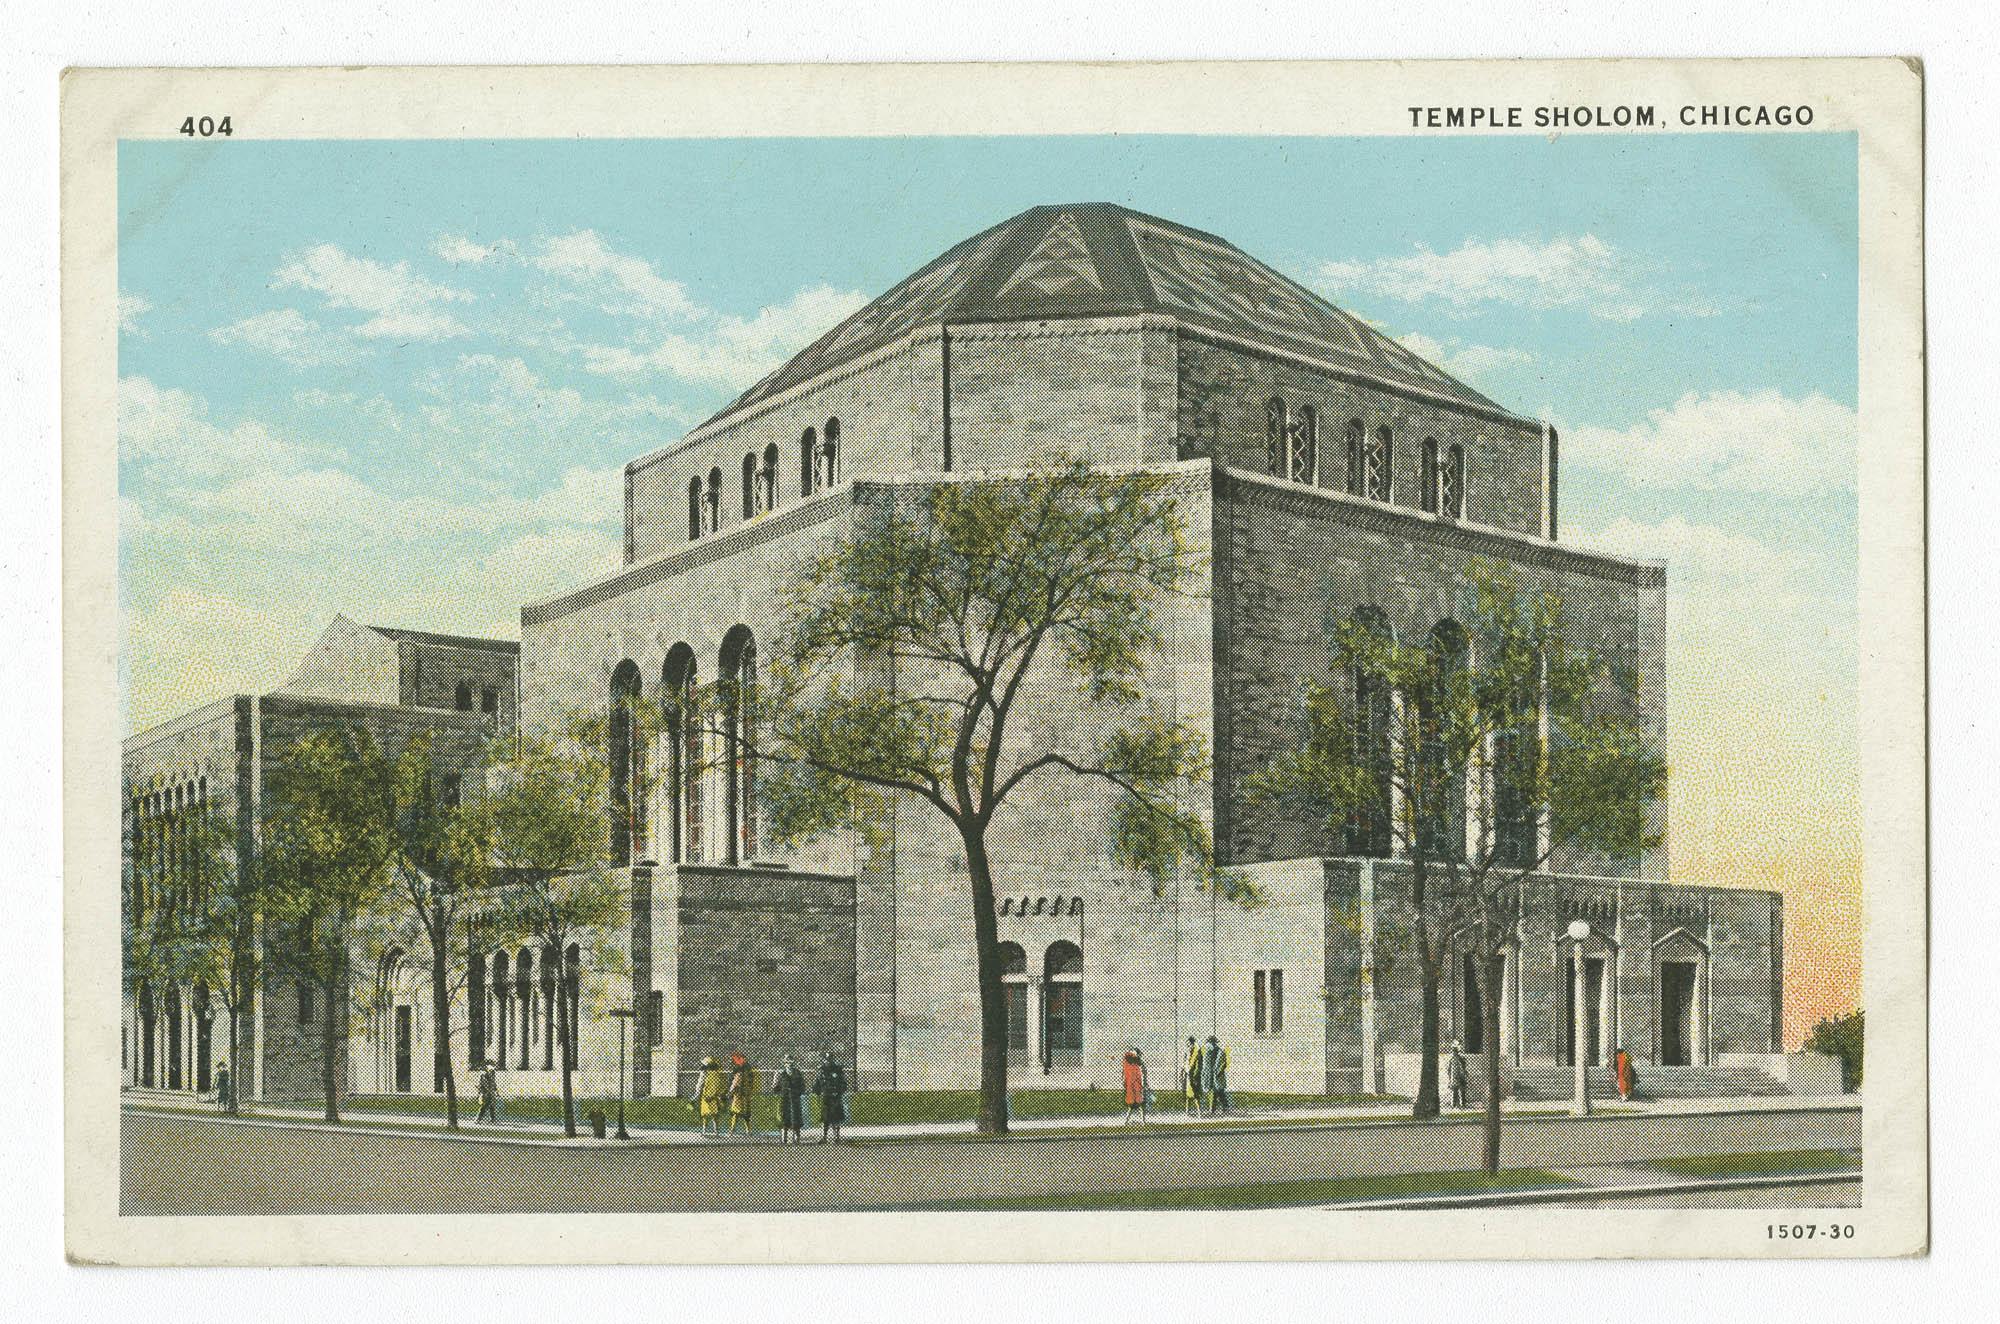 Temple Sholom, Chicago